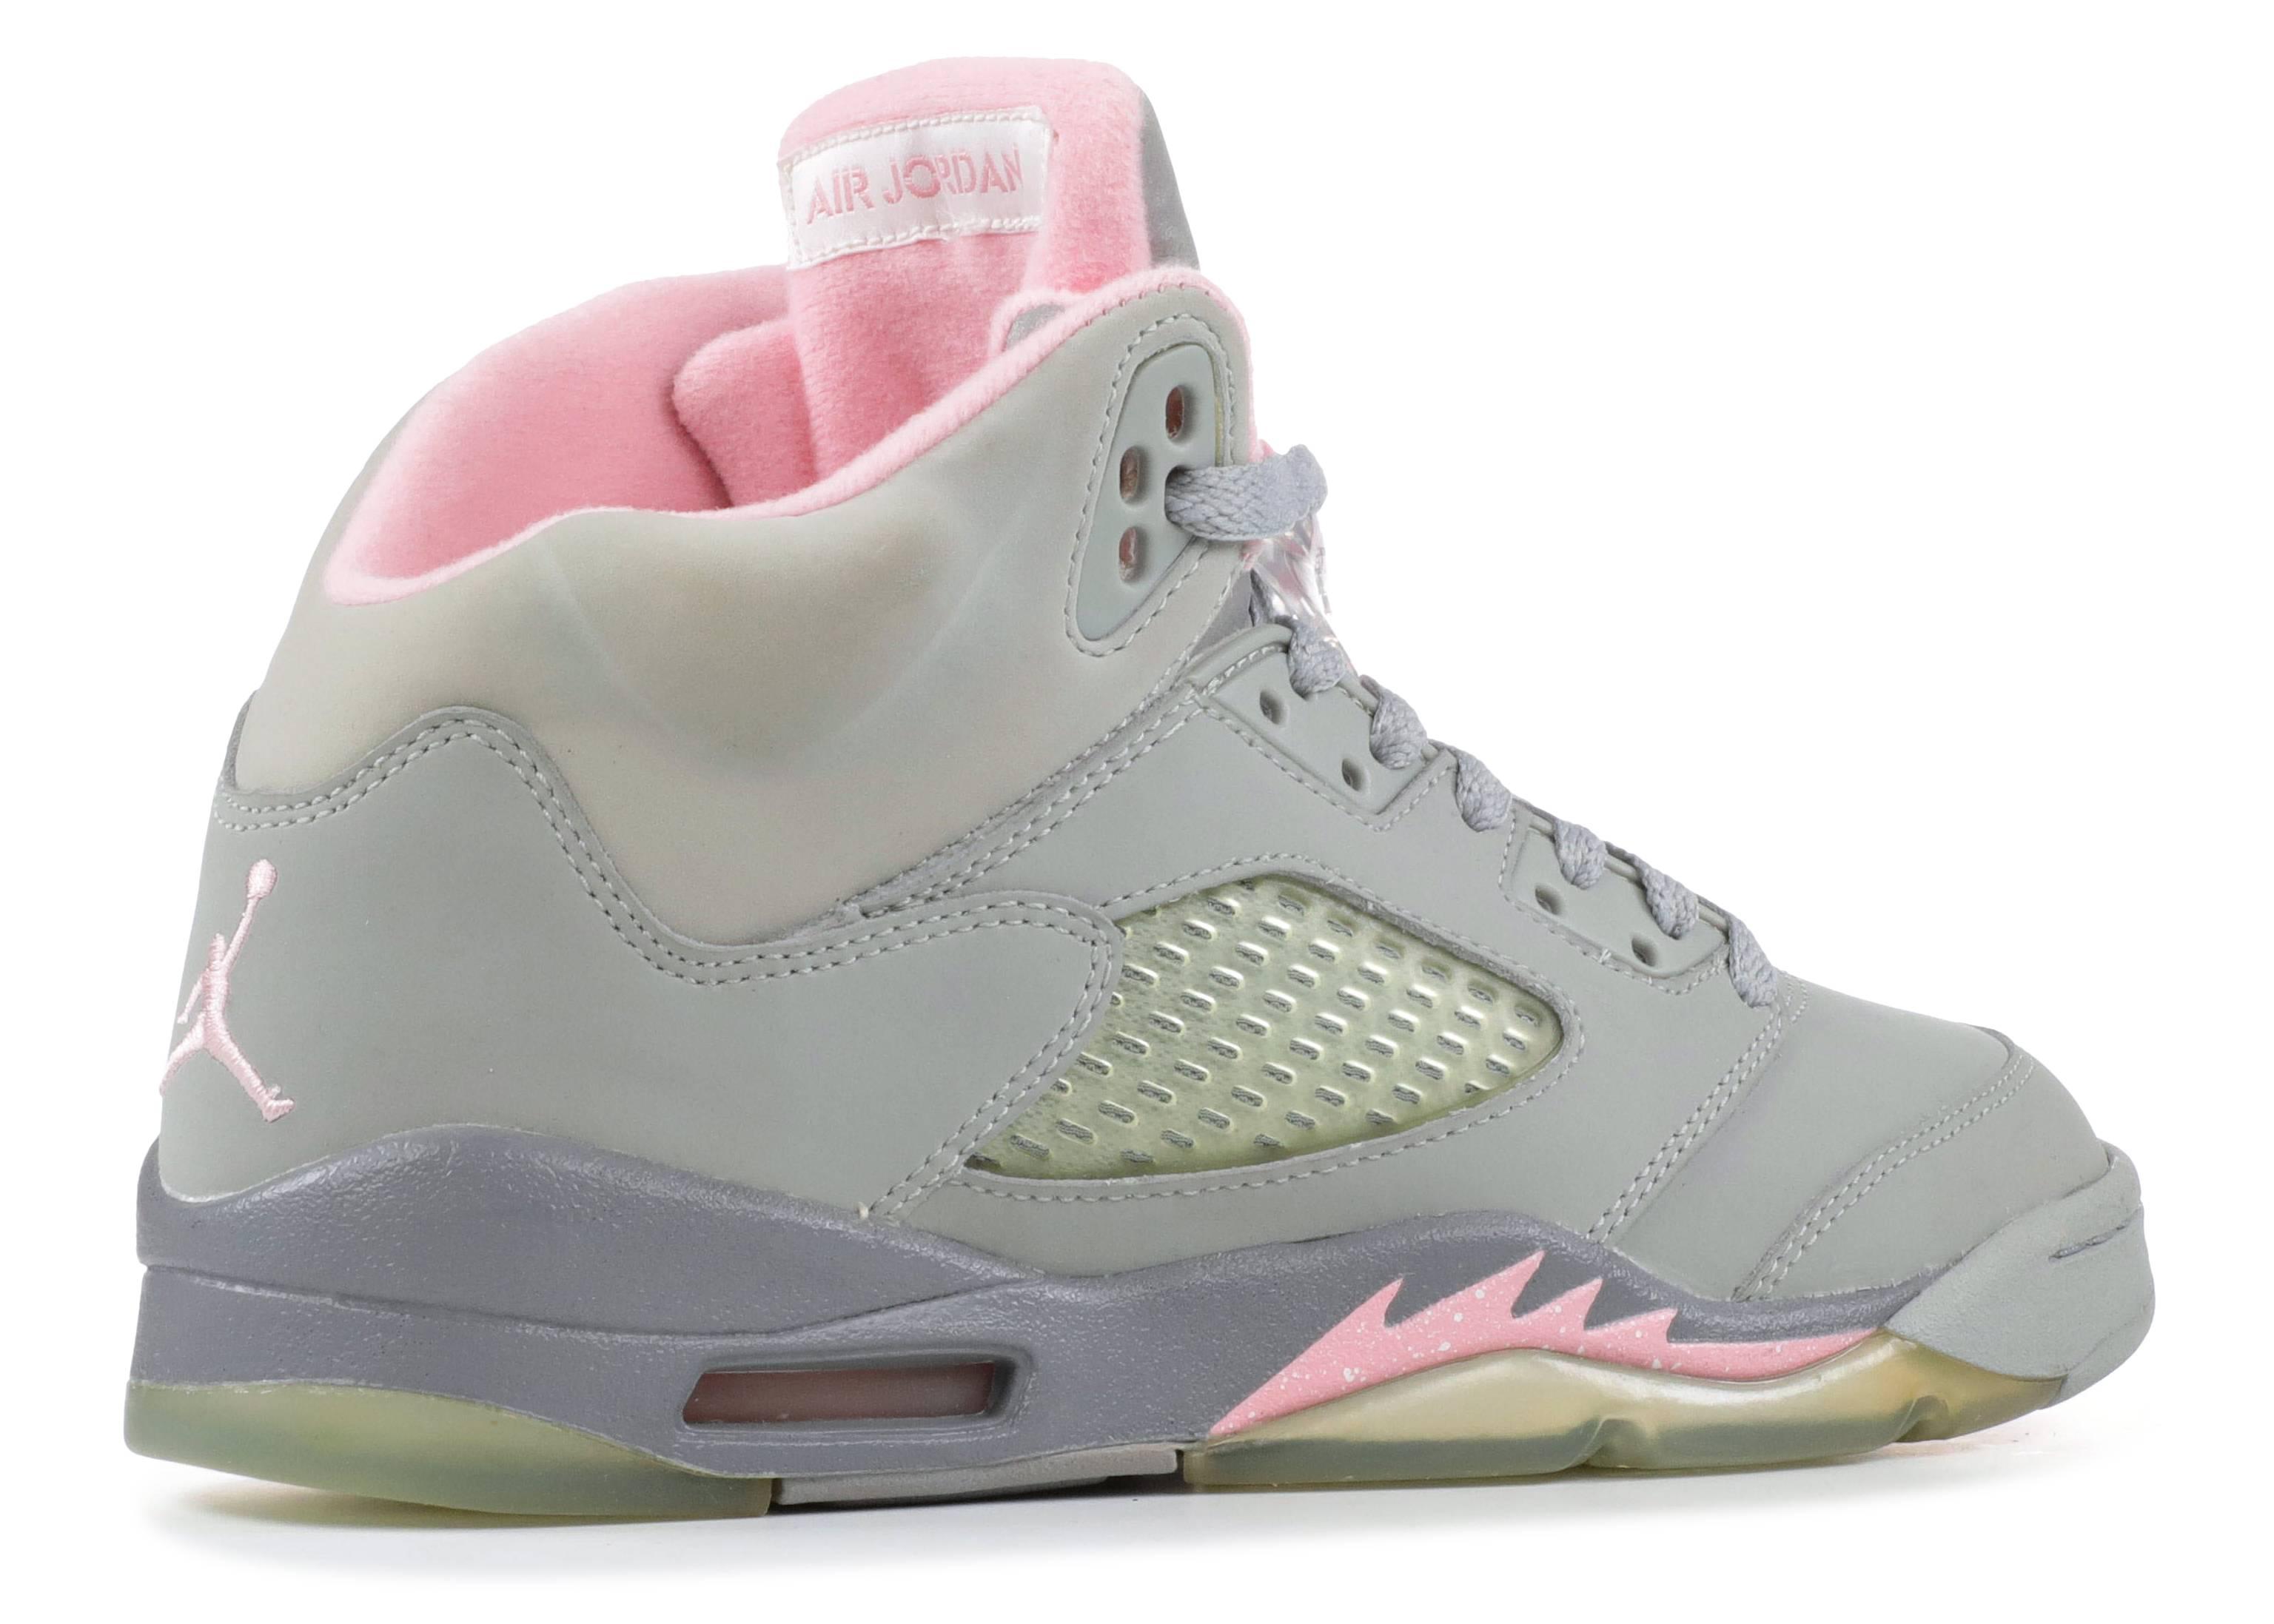 e0756f70ef8 Air Jordan 5 Retro (gs) - Air Jordan - 134092 061 - silver/shy pink ...